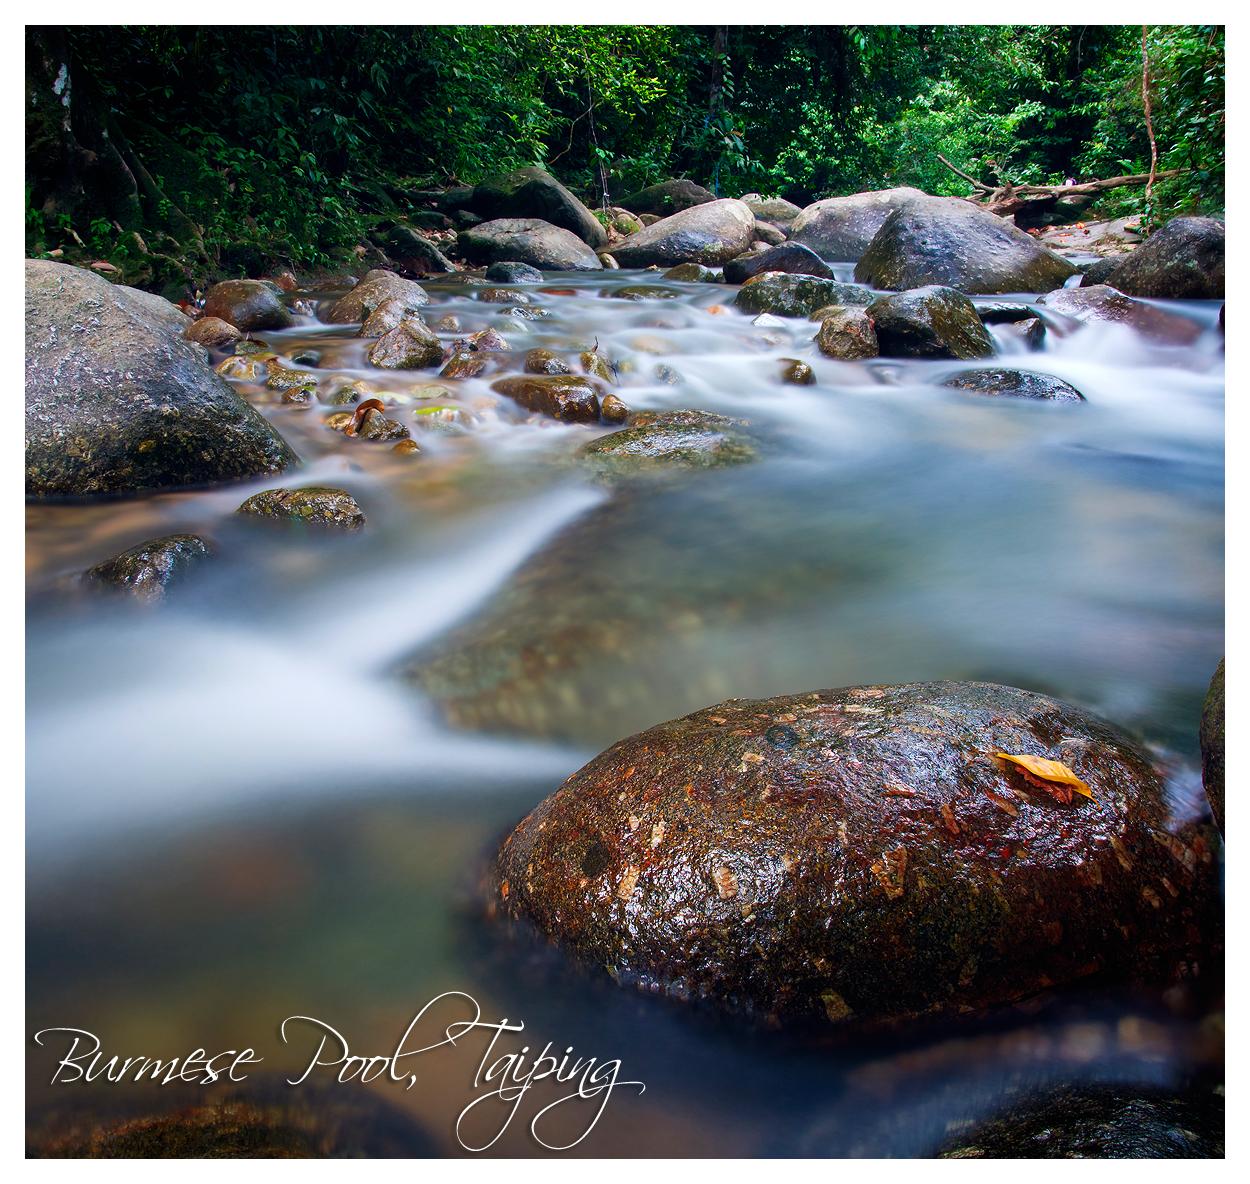 Burmese Pool, Taiping